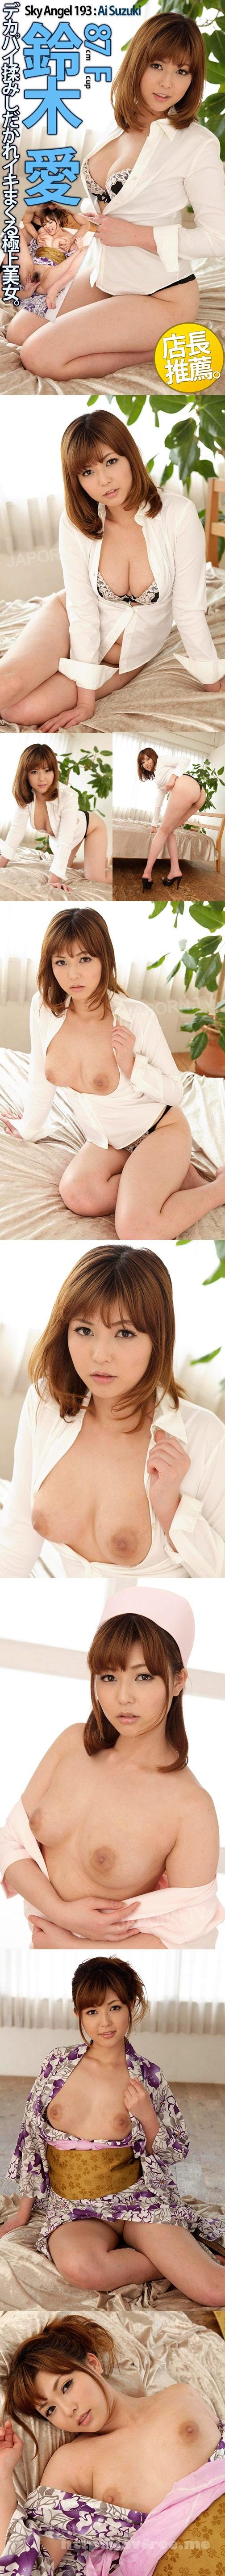 [SKY 321] スカイエンジェル Vol.193 : 鈴木愛 鈴木愛 SKY Ai Suzuki